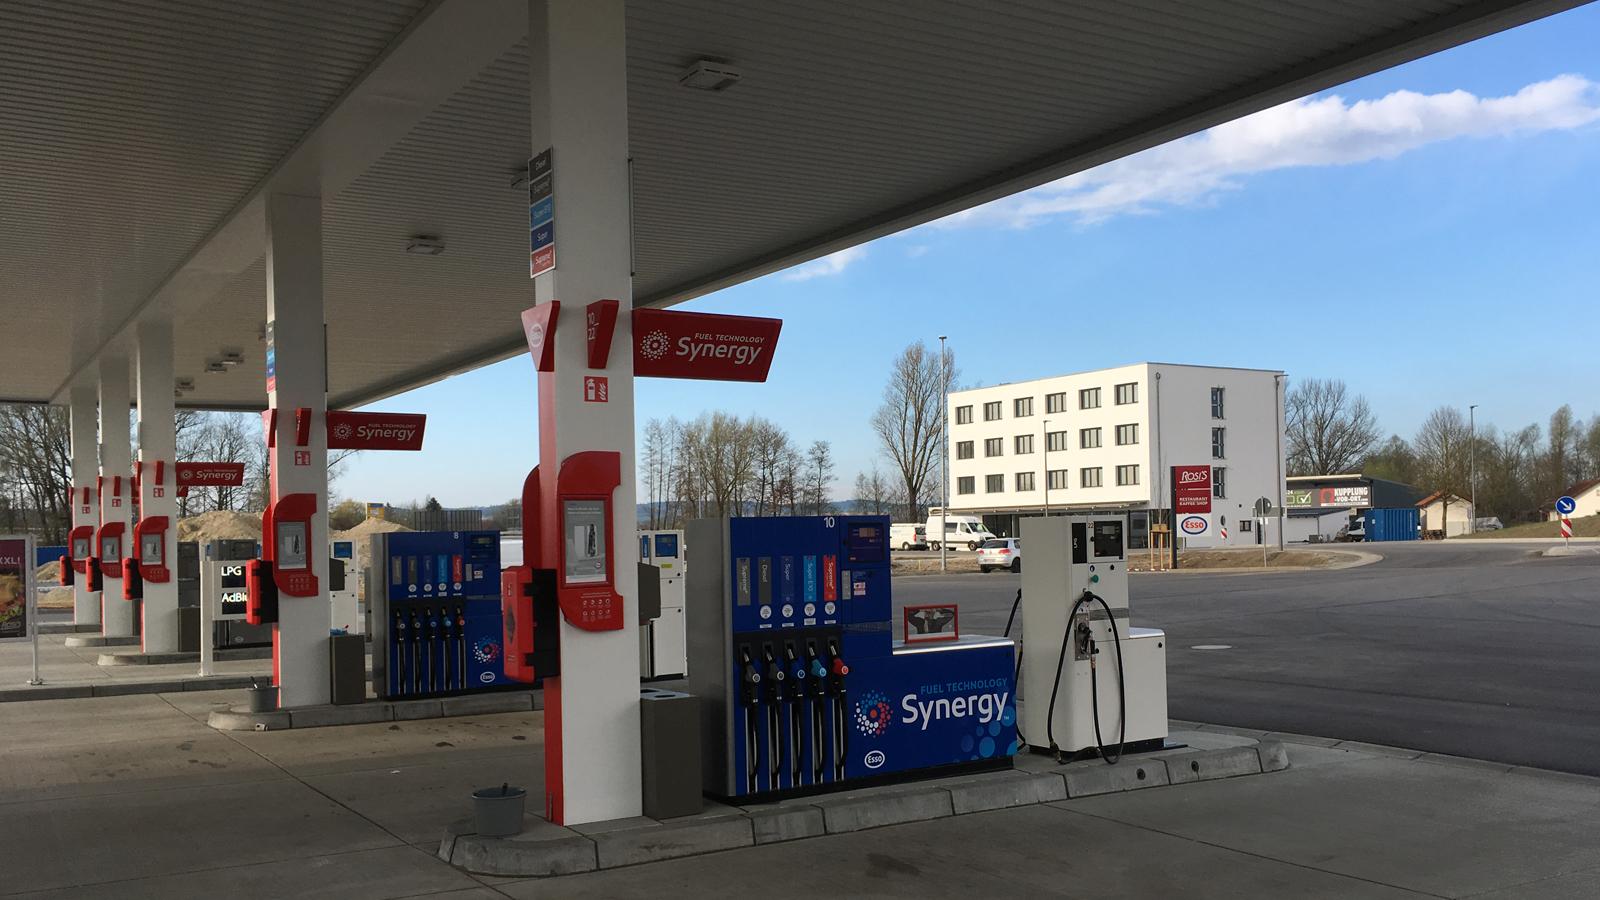 Architekt Bonn Autohof Tankstelle Pilsting, Koenigs Rütter Architekten, Architekt Bonn